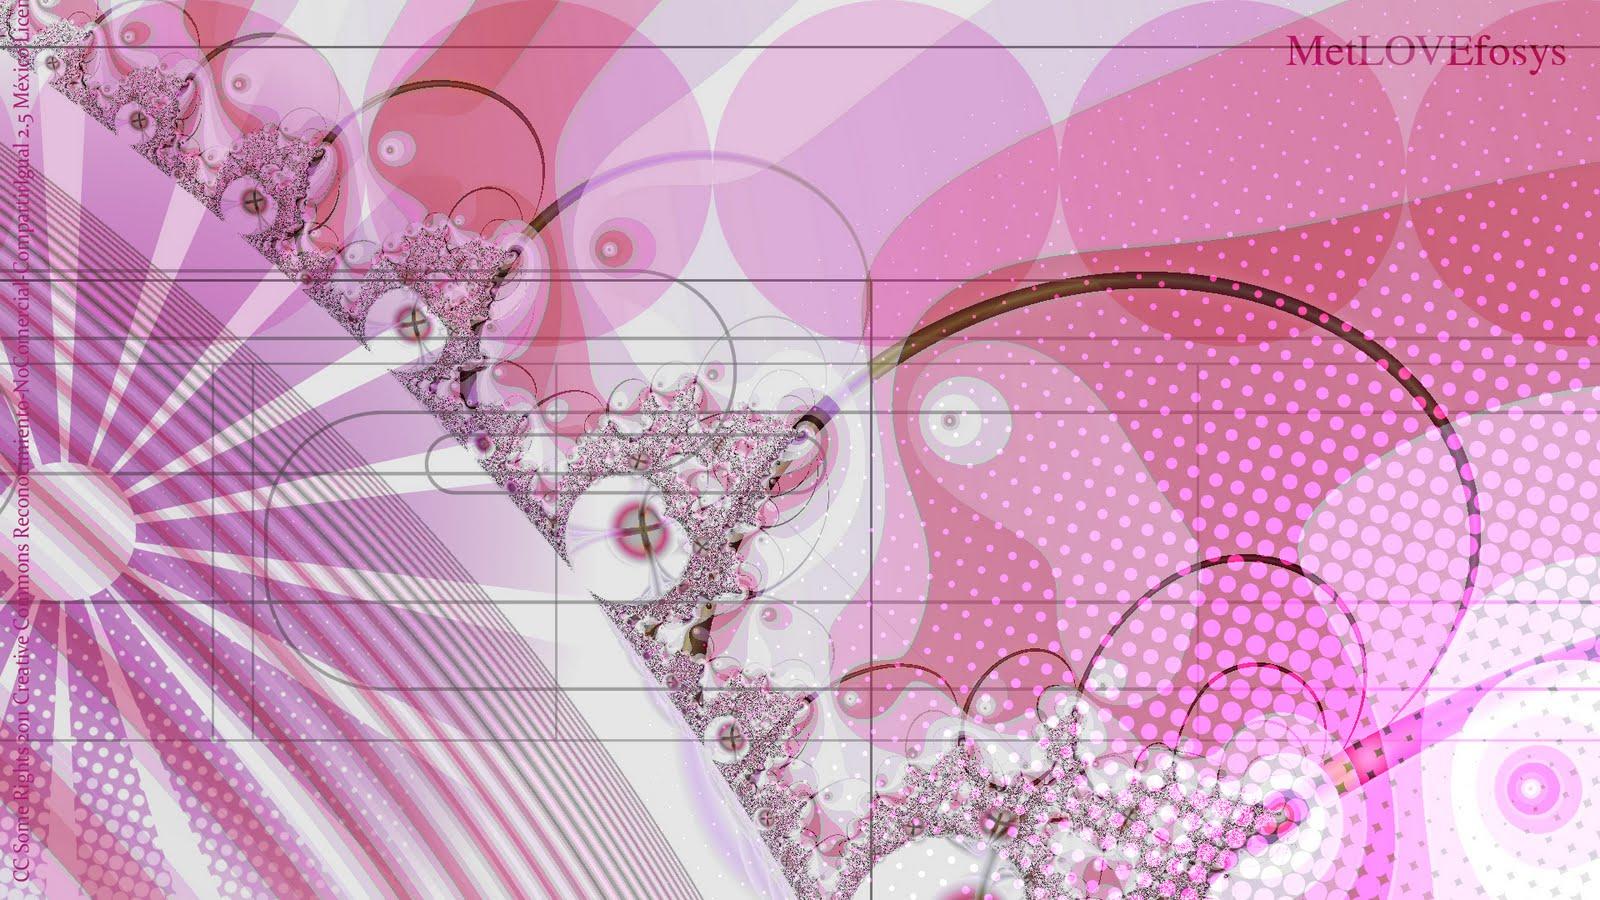 http://4.bp.blogspot.com/-pnESQQa73zA/Te6ncYPfEjI/AAAAAAAAAEA/PUdlB4jNZBw/s1600/wall%20%20fractal%20camino%20rosa.jpg